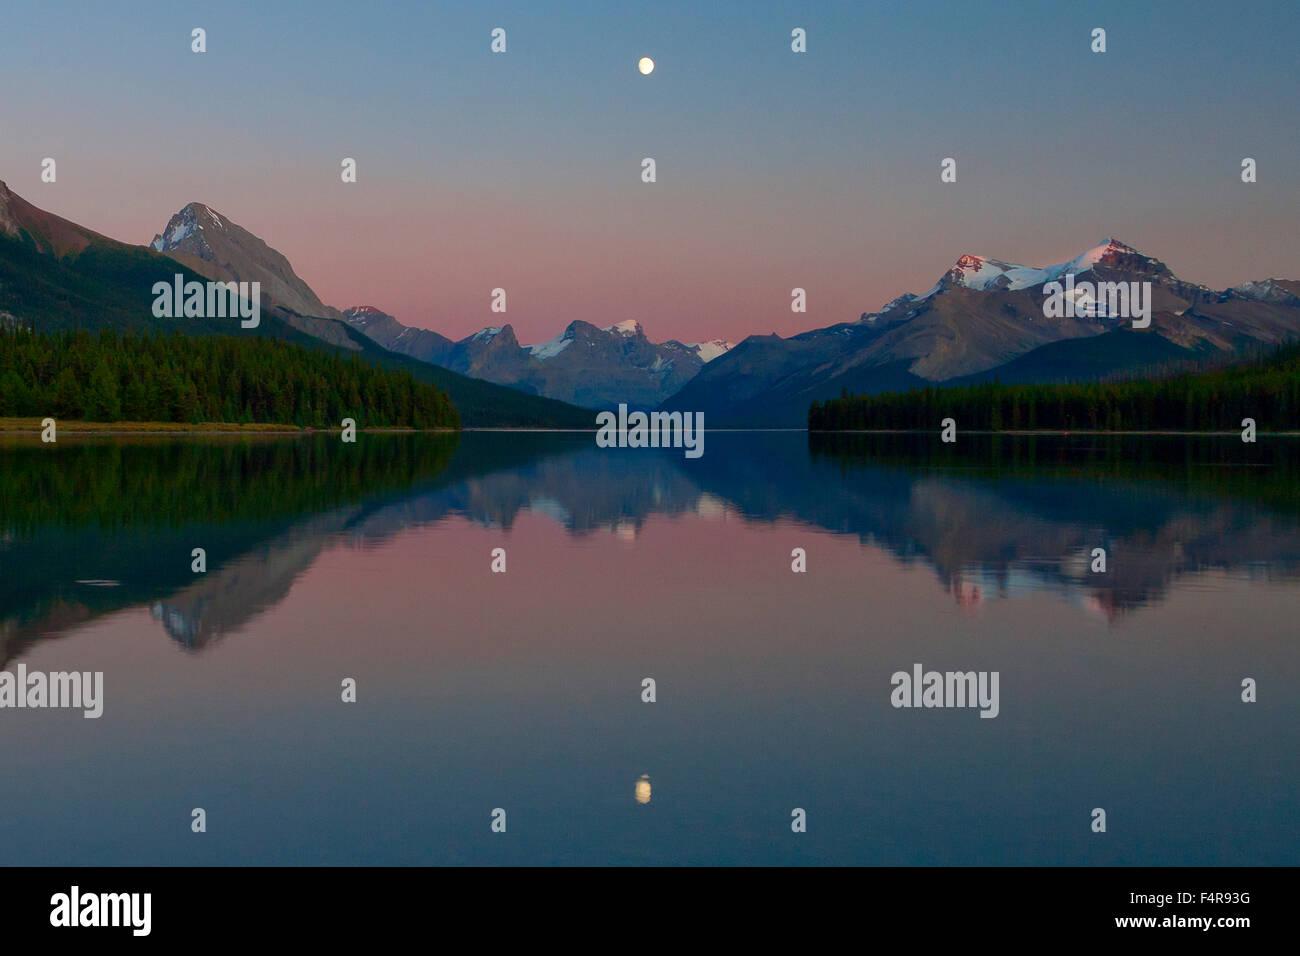 Kanada, Provinz, Natur, Landschaft, Rockies, kanadischen Rocky Mountains, Gebirge, See, Landschaft, Malign, Nationalpark, Stockbild